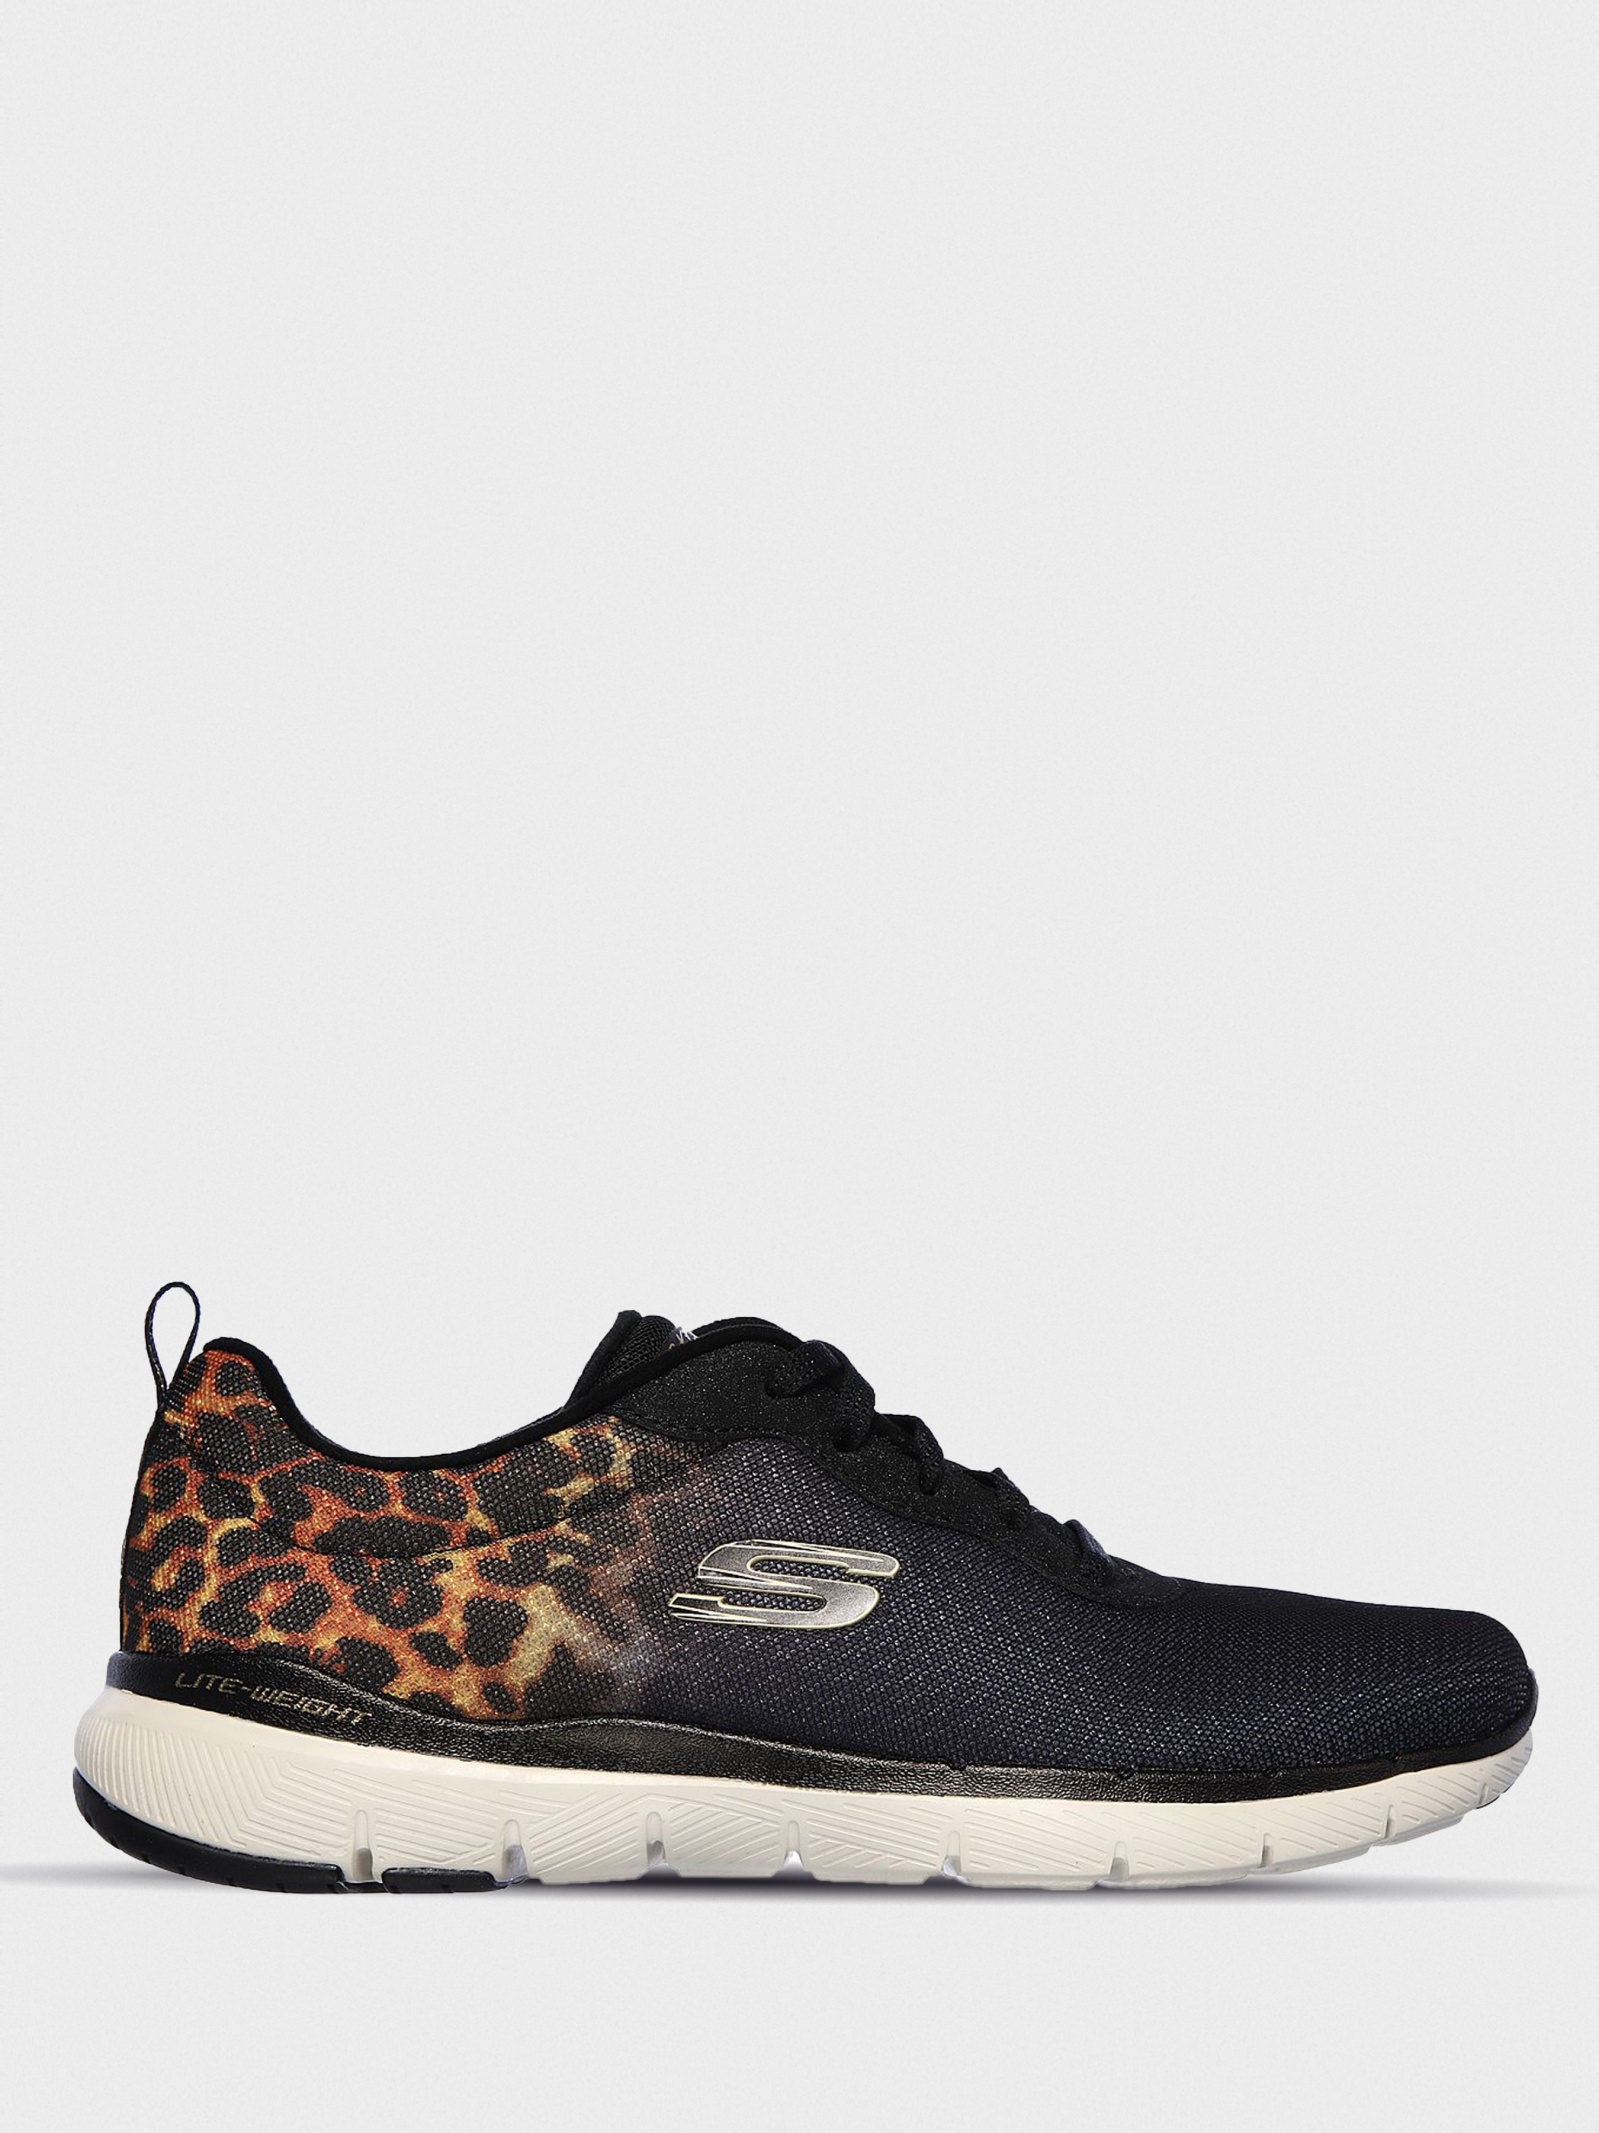 Кроссовки женские Skechers Skechers Womens Sport KW5434 модная обувь, 2017